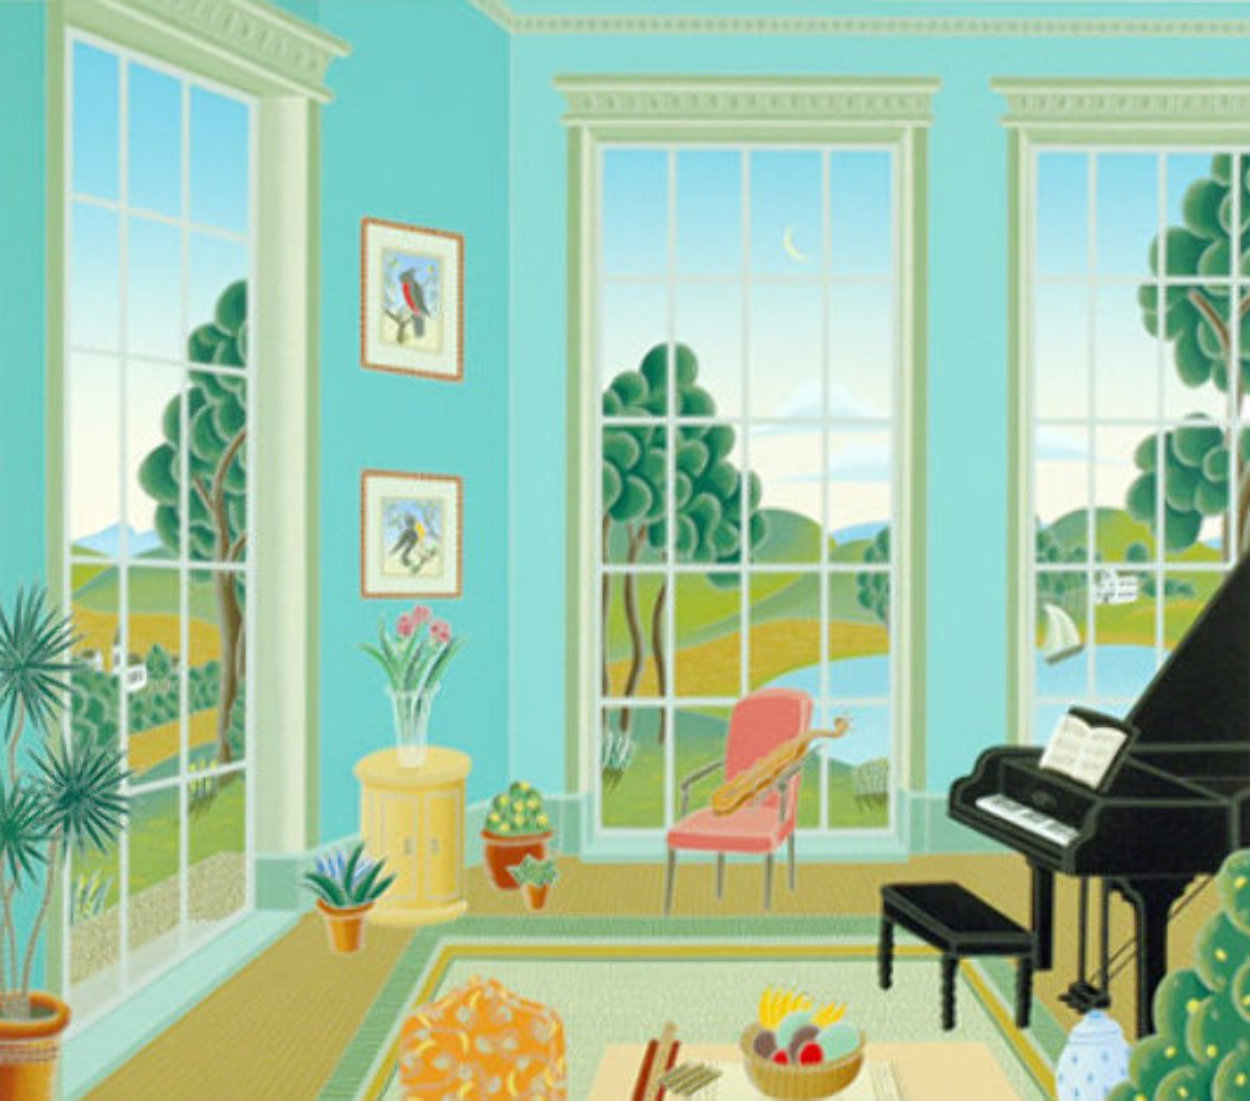 Stockbridge 1999 Huge Limited Edition Print by Thomas Frederick McKnight